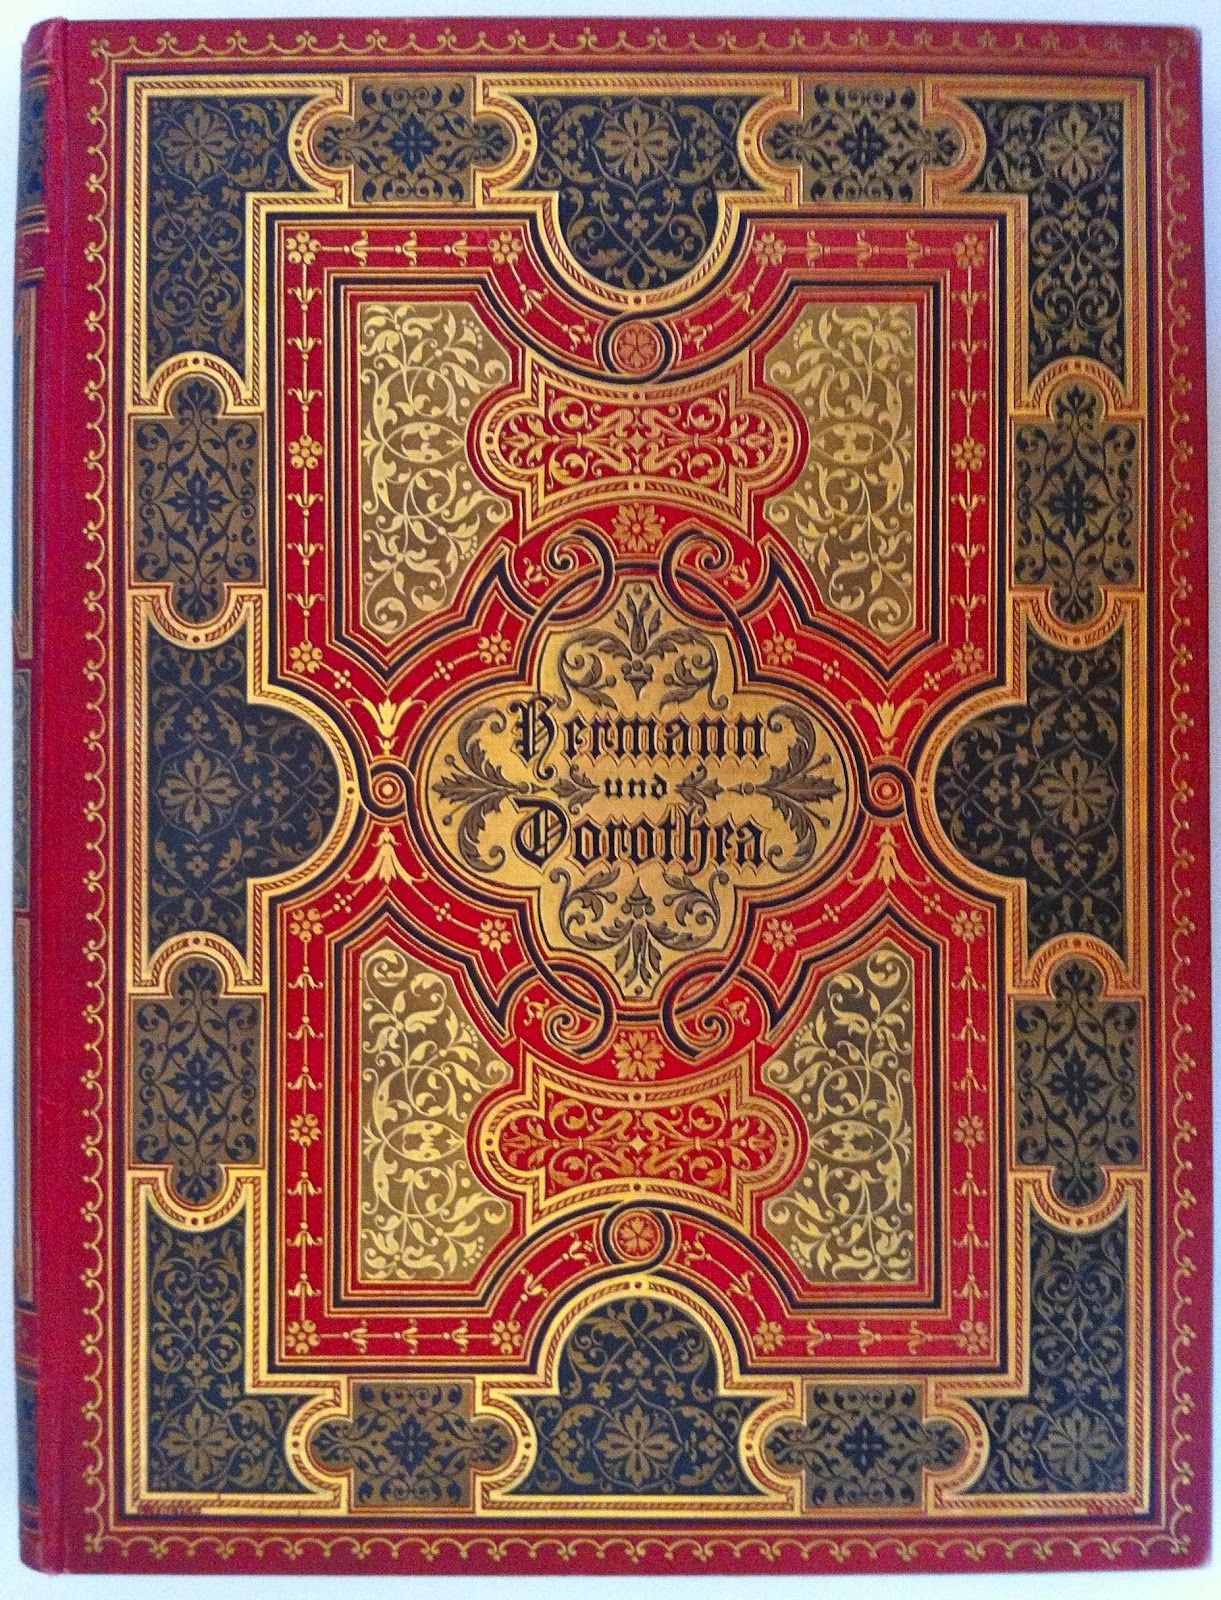 Goethes Hermann Dorothea